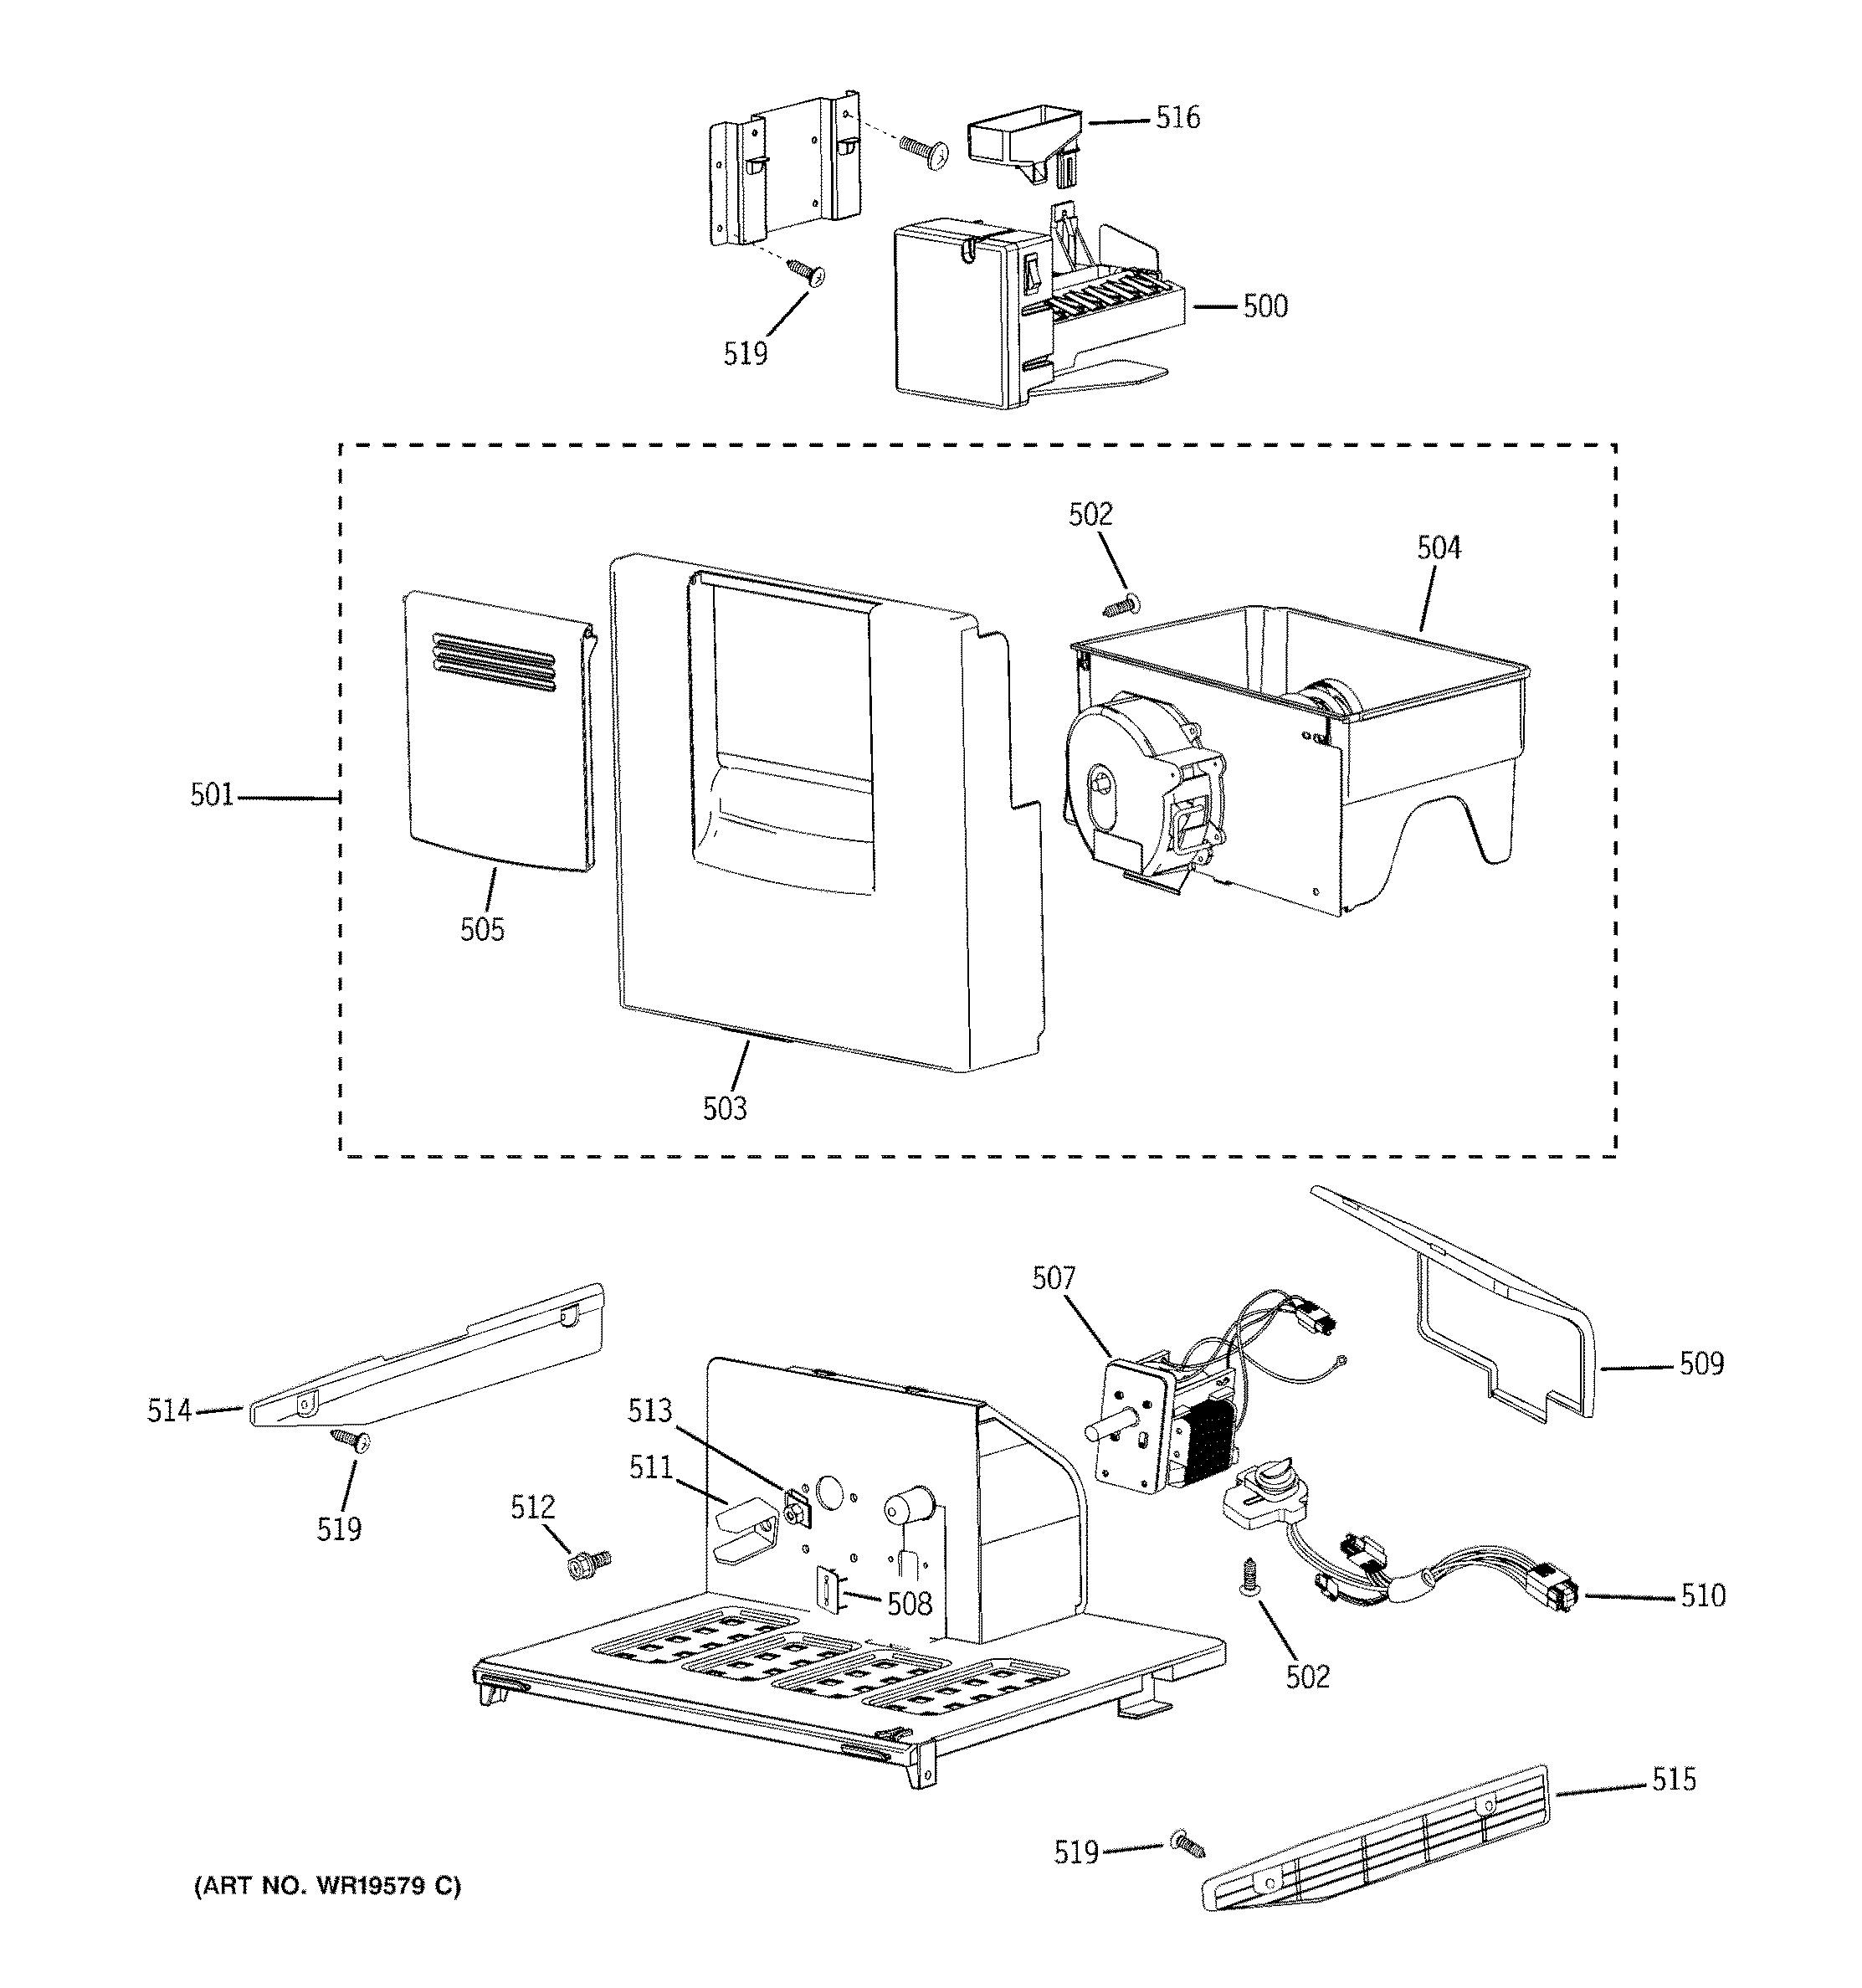 assembly view for ice maker  u0026 dispenser